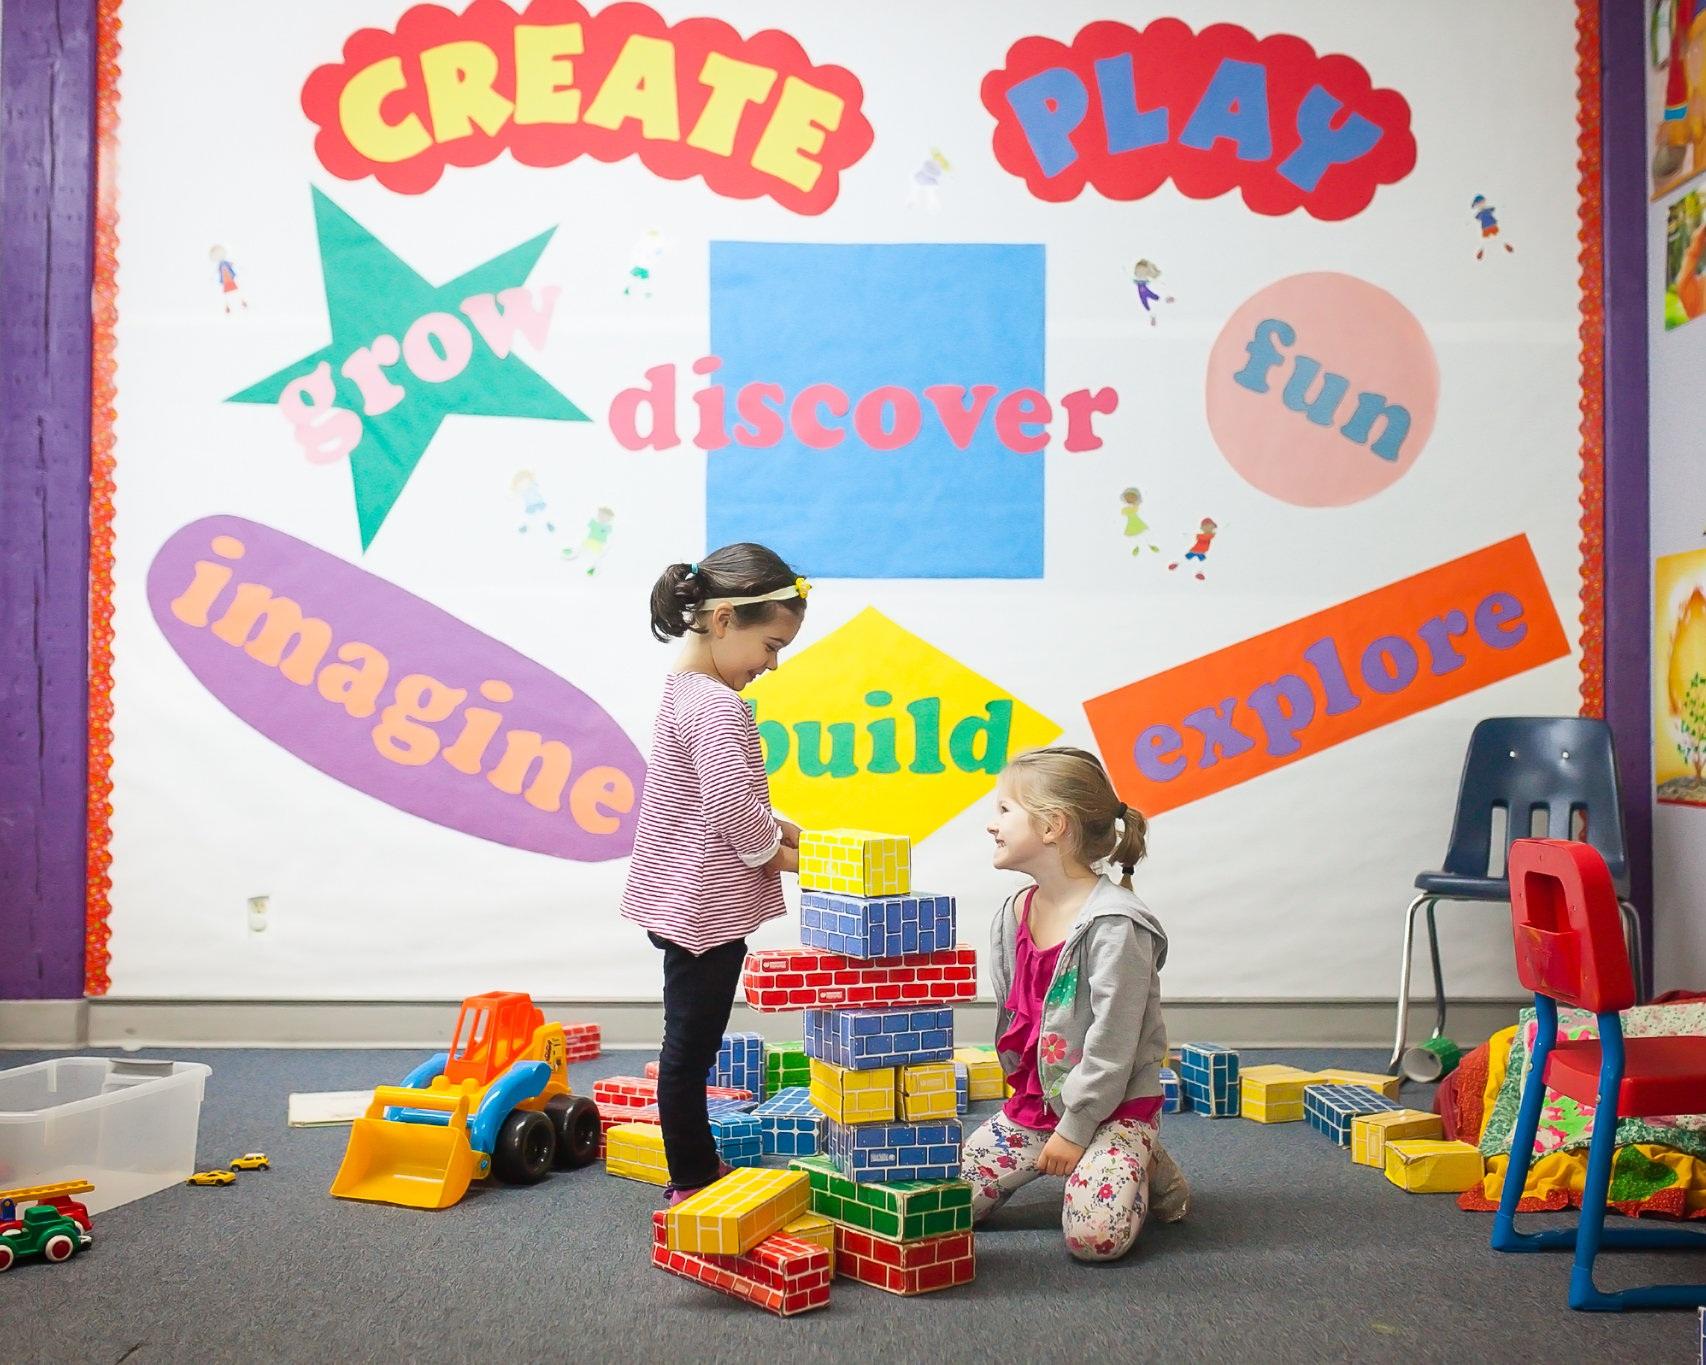 create & play - Wednesdays9:00 a.m. – 11:30 a.m.